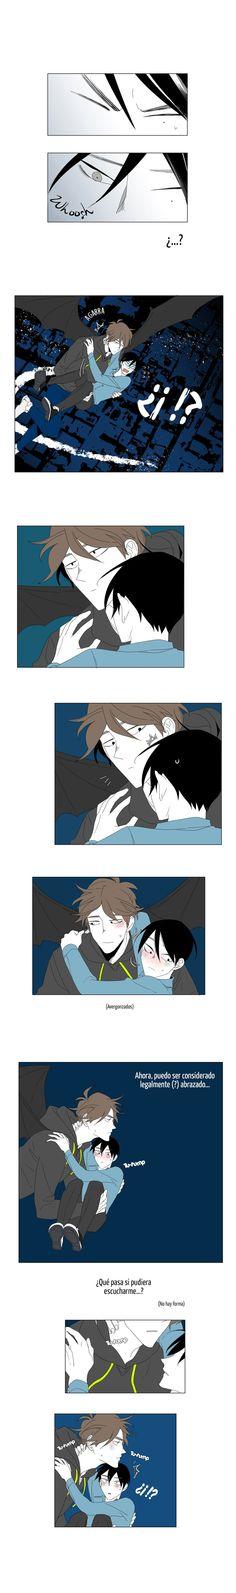 Manga Bagjwi Sayug -Raising a Bat- cápitulo 22 página 000a_190417.jpg